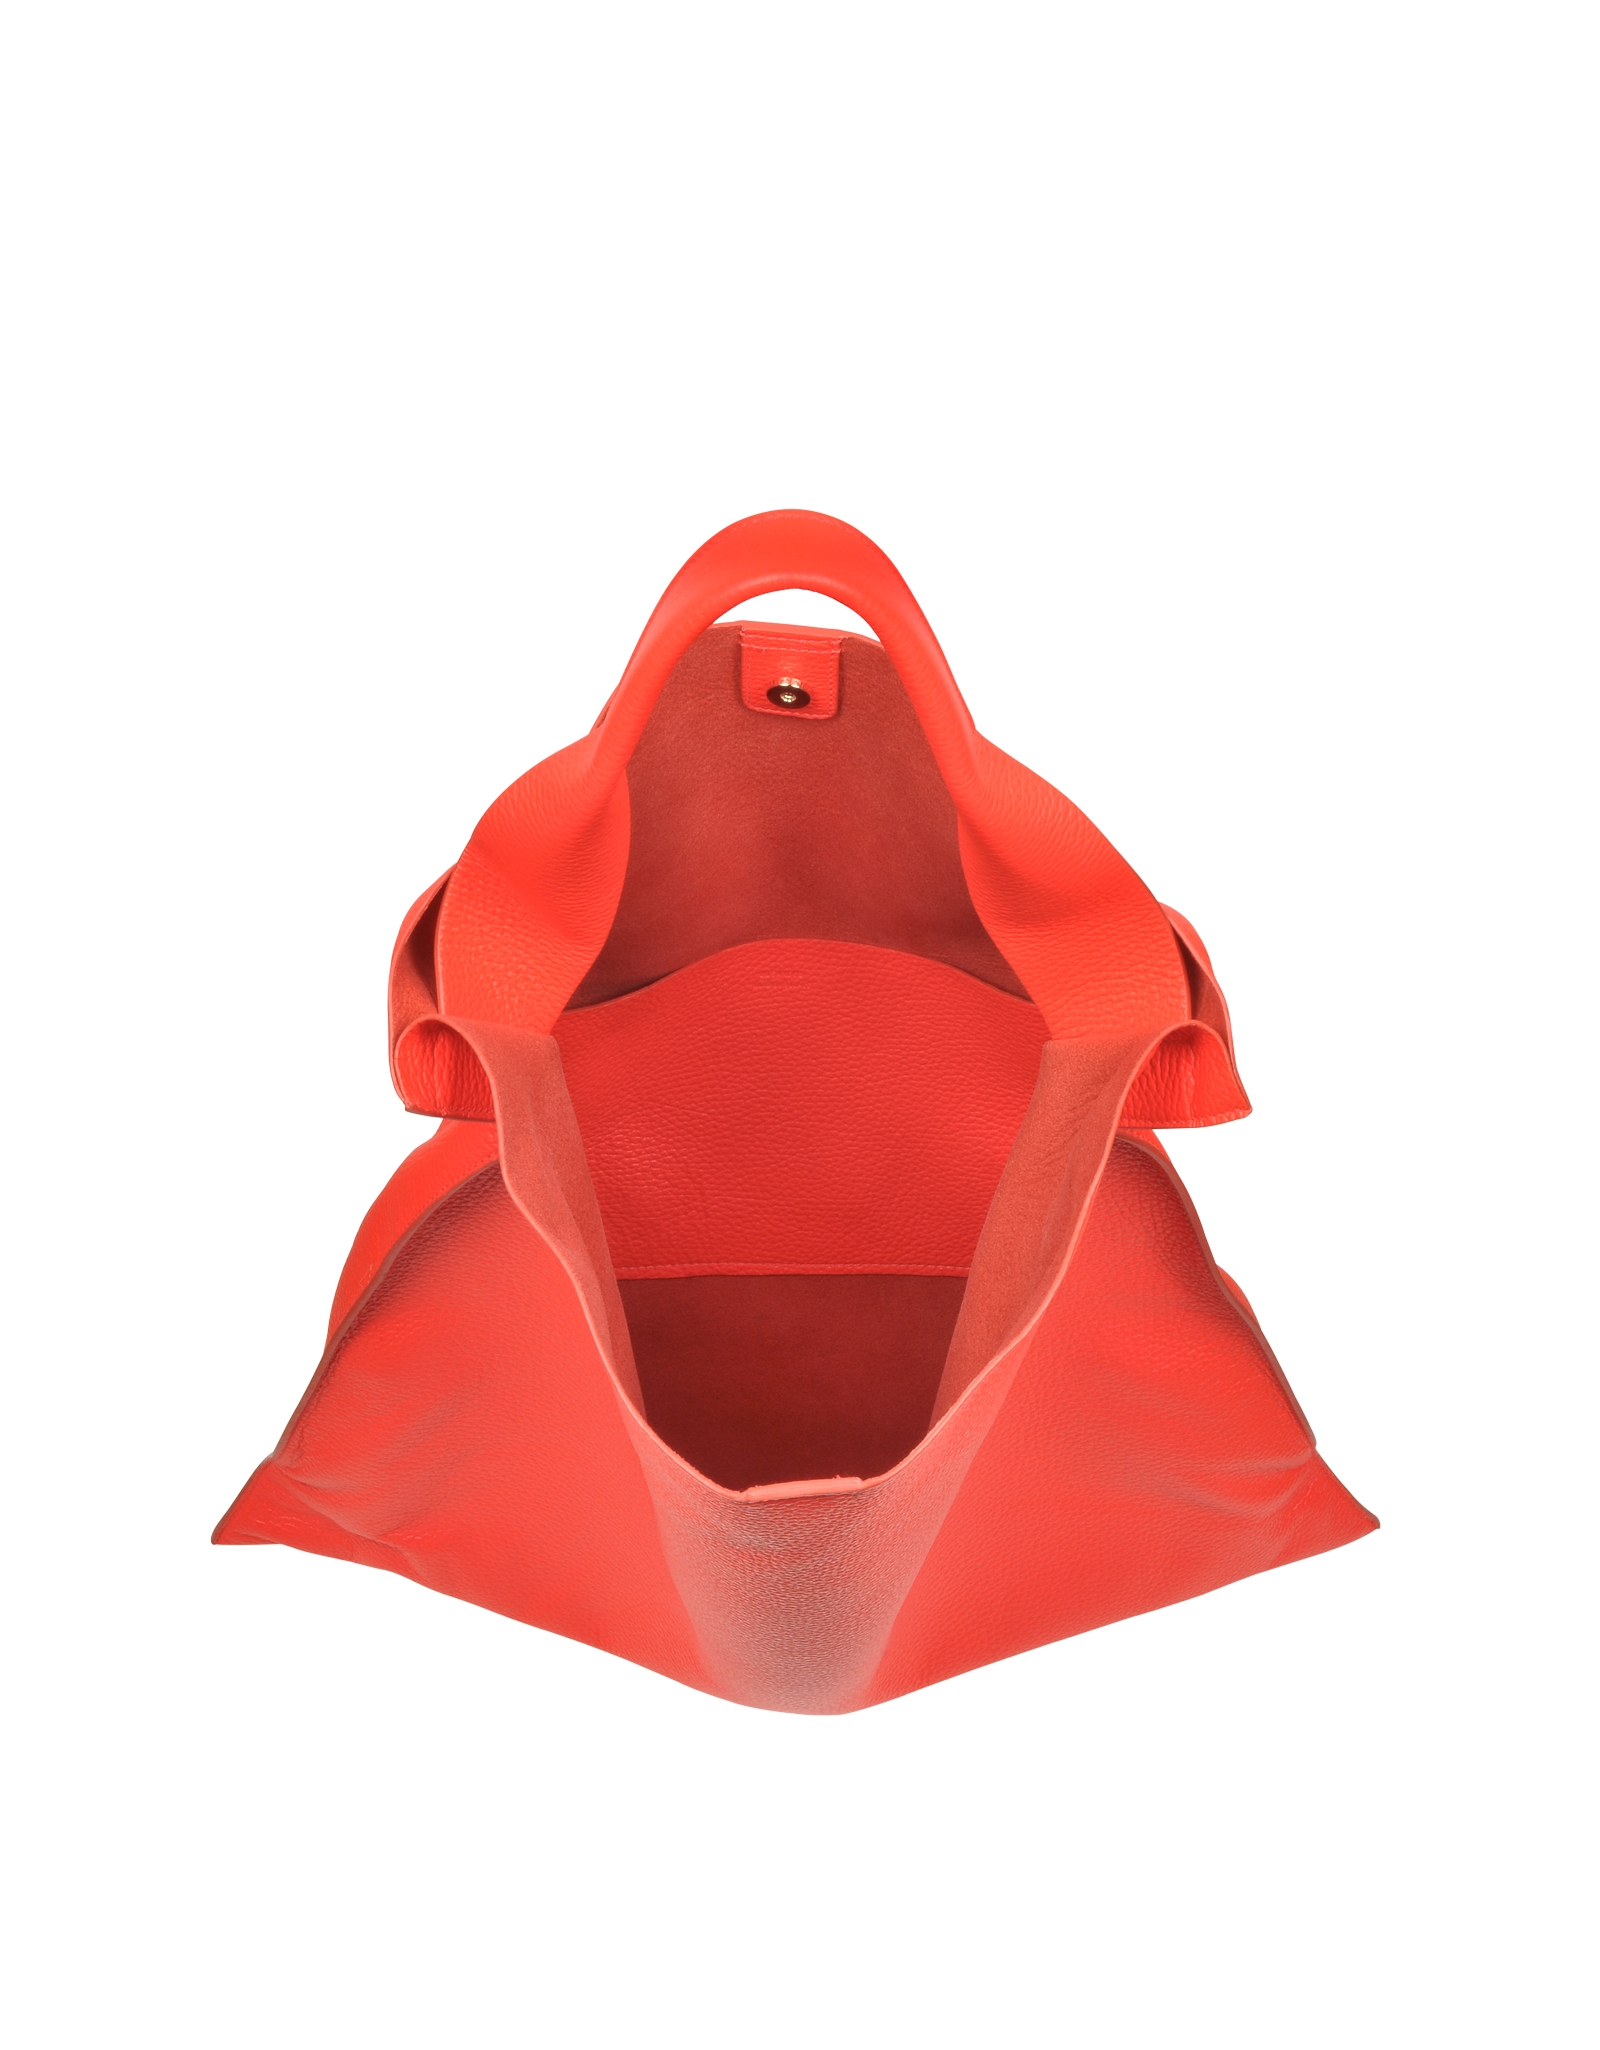 jil sander bright orange leather xiao bag in orange lyst